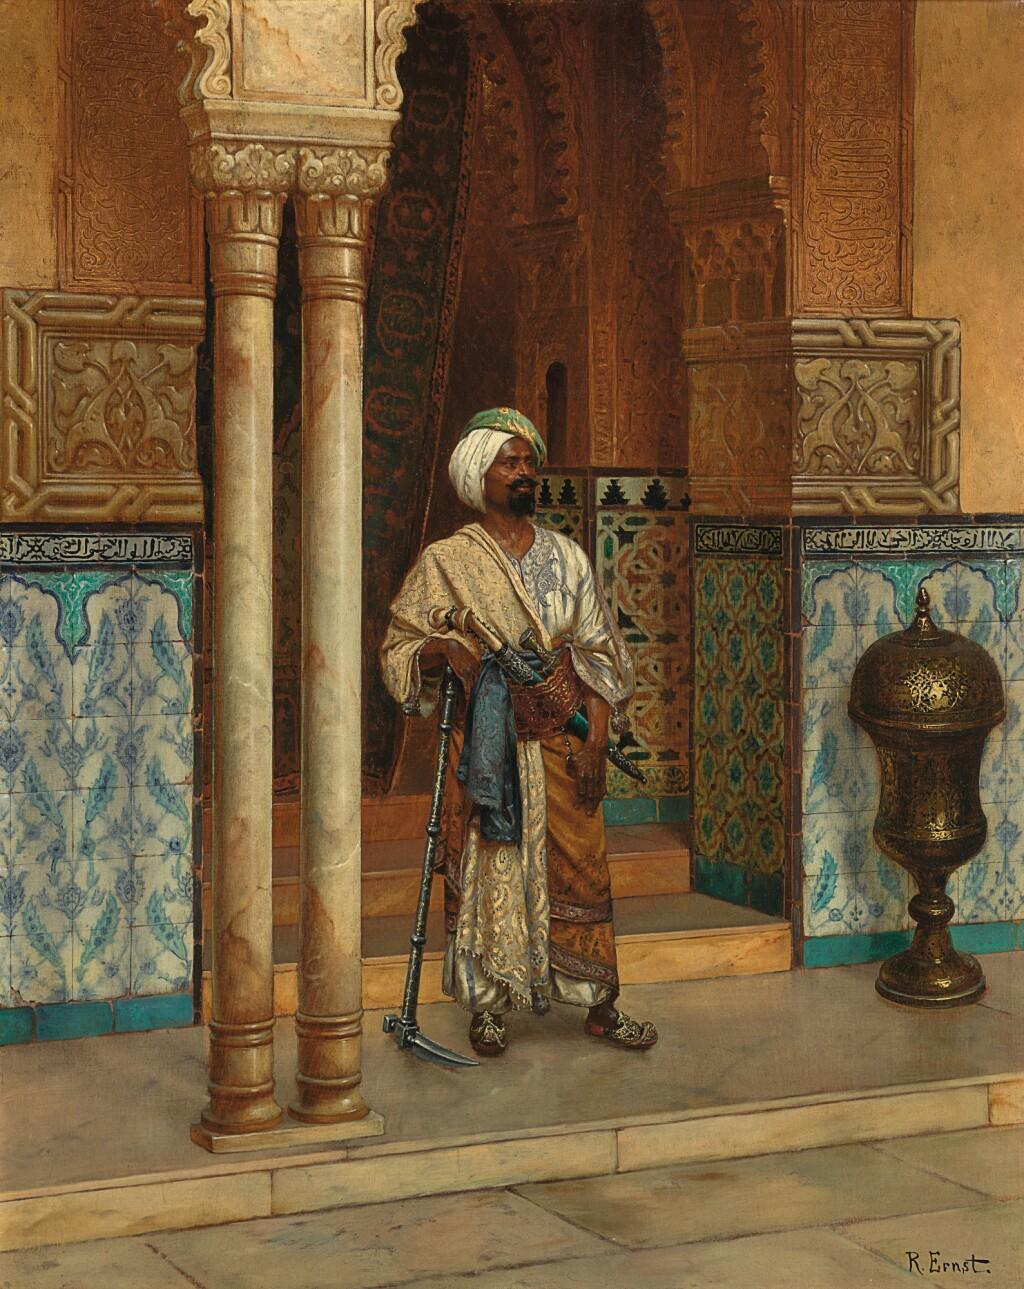 RUDOLF ERNST | THE PALACE GUARD